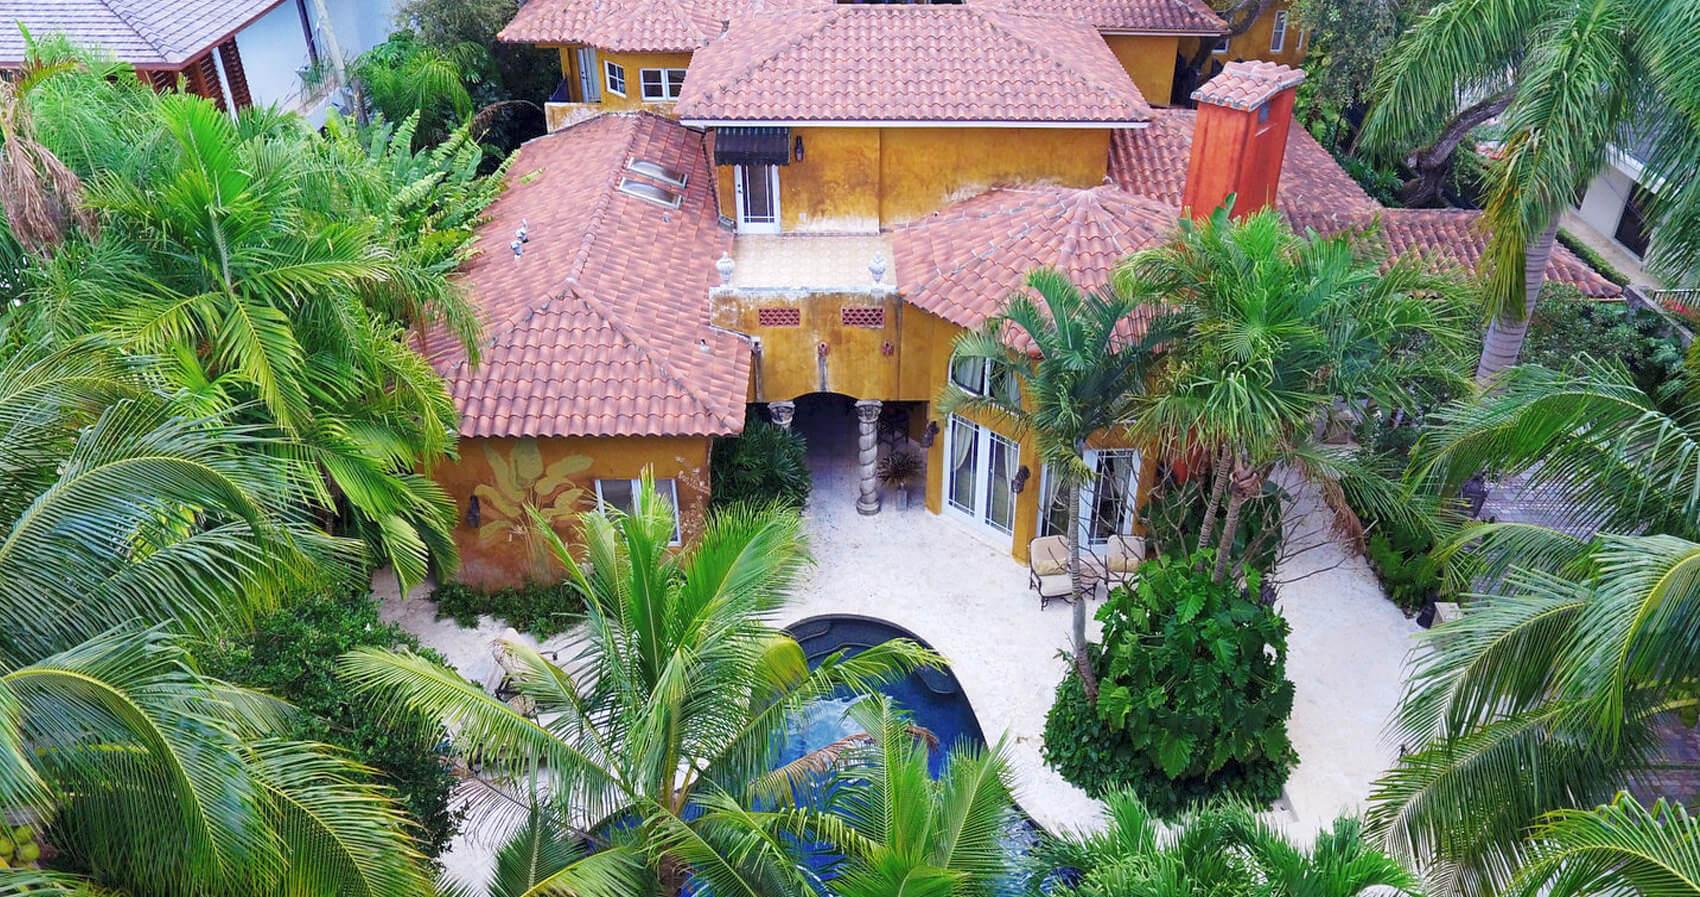 21__coconut_grove_aerial_photo_by_MiamiRealEstatePhotographers.com